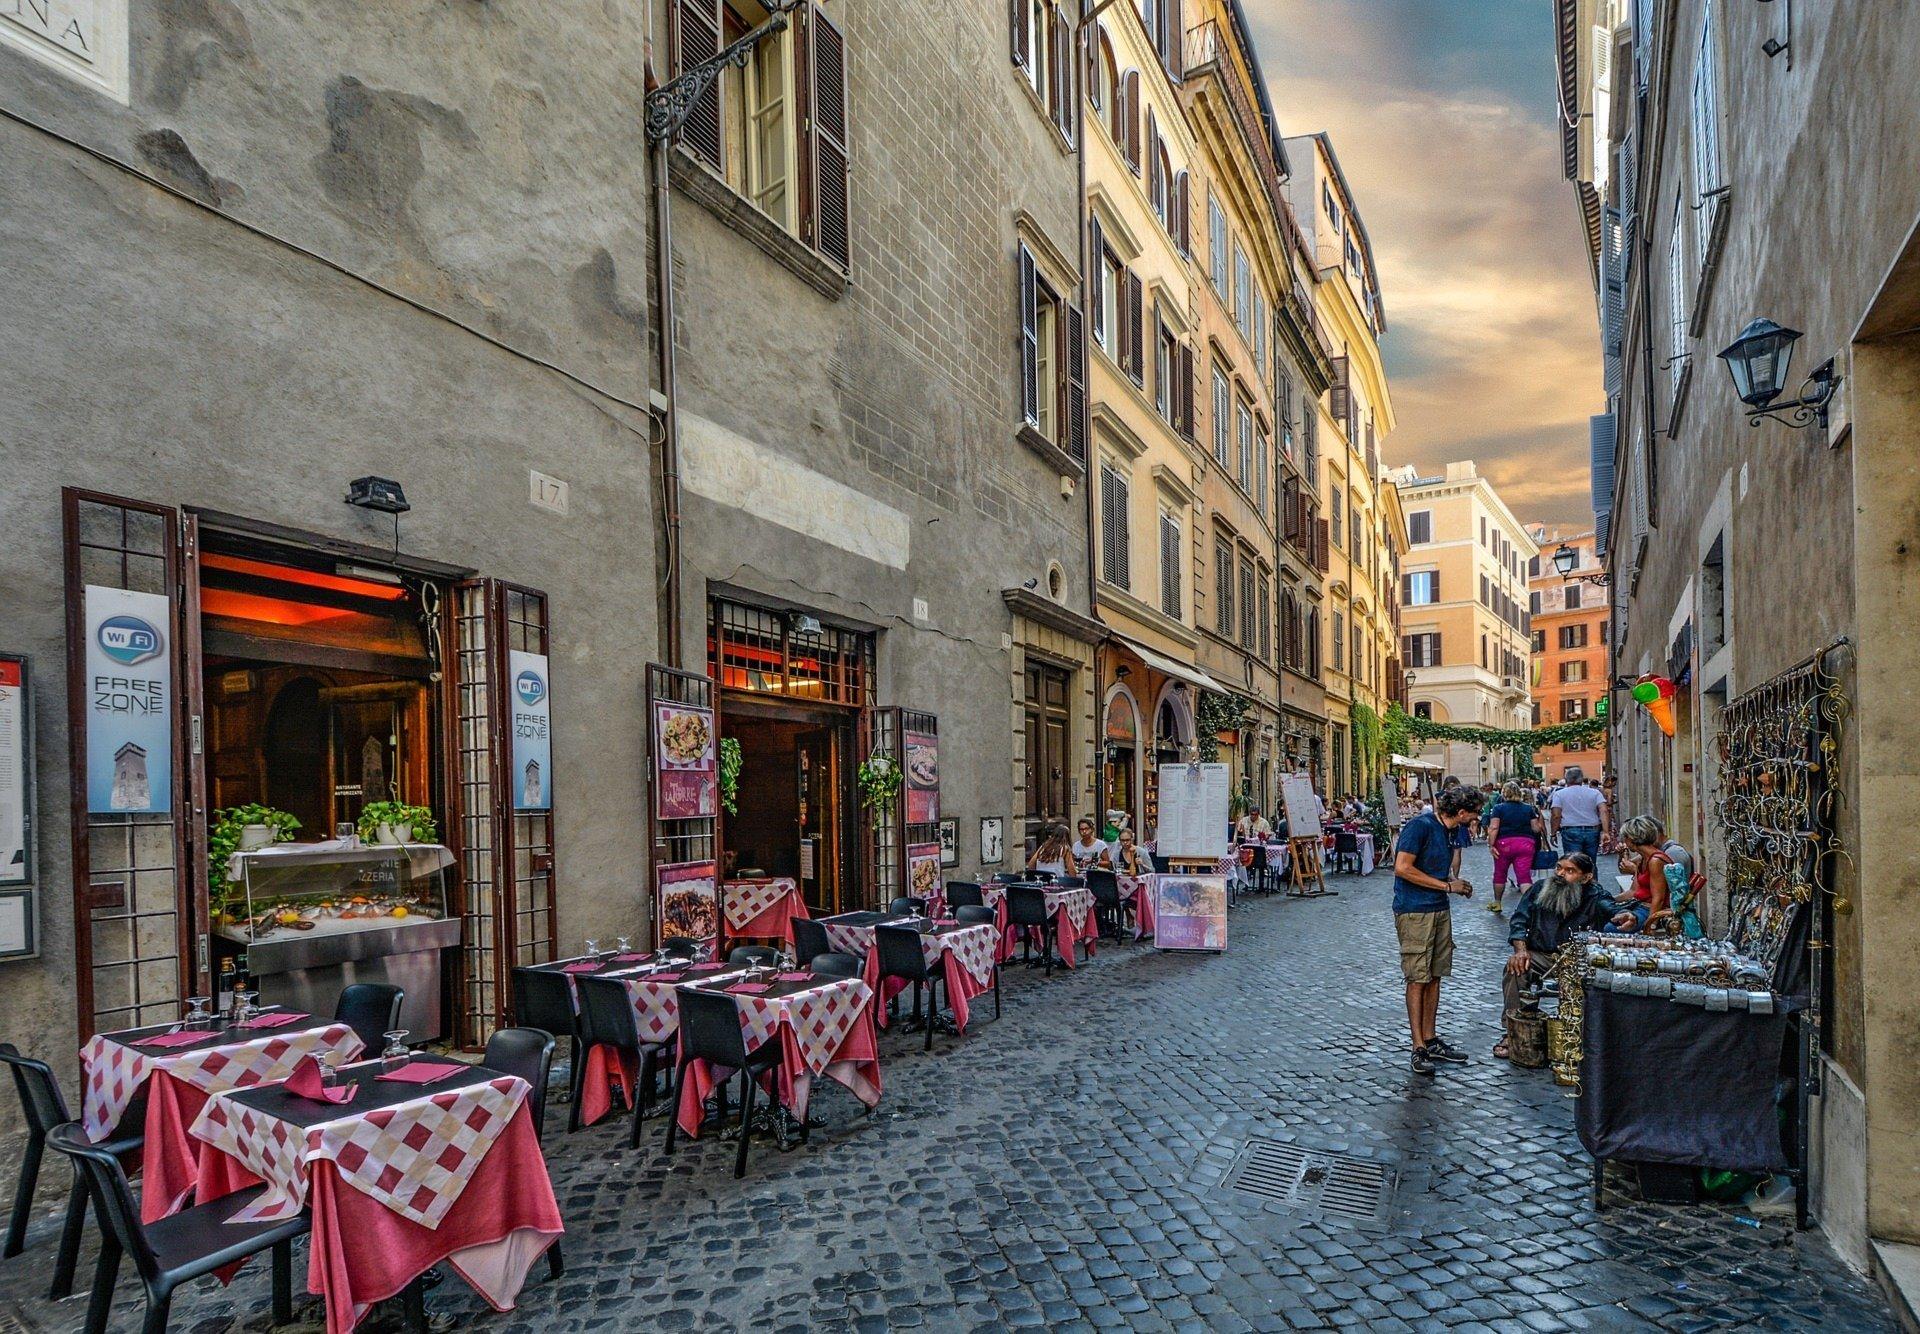 12-Day Sorrento to Venice - Vatican City and Italy Itinerary